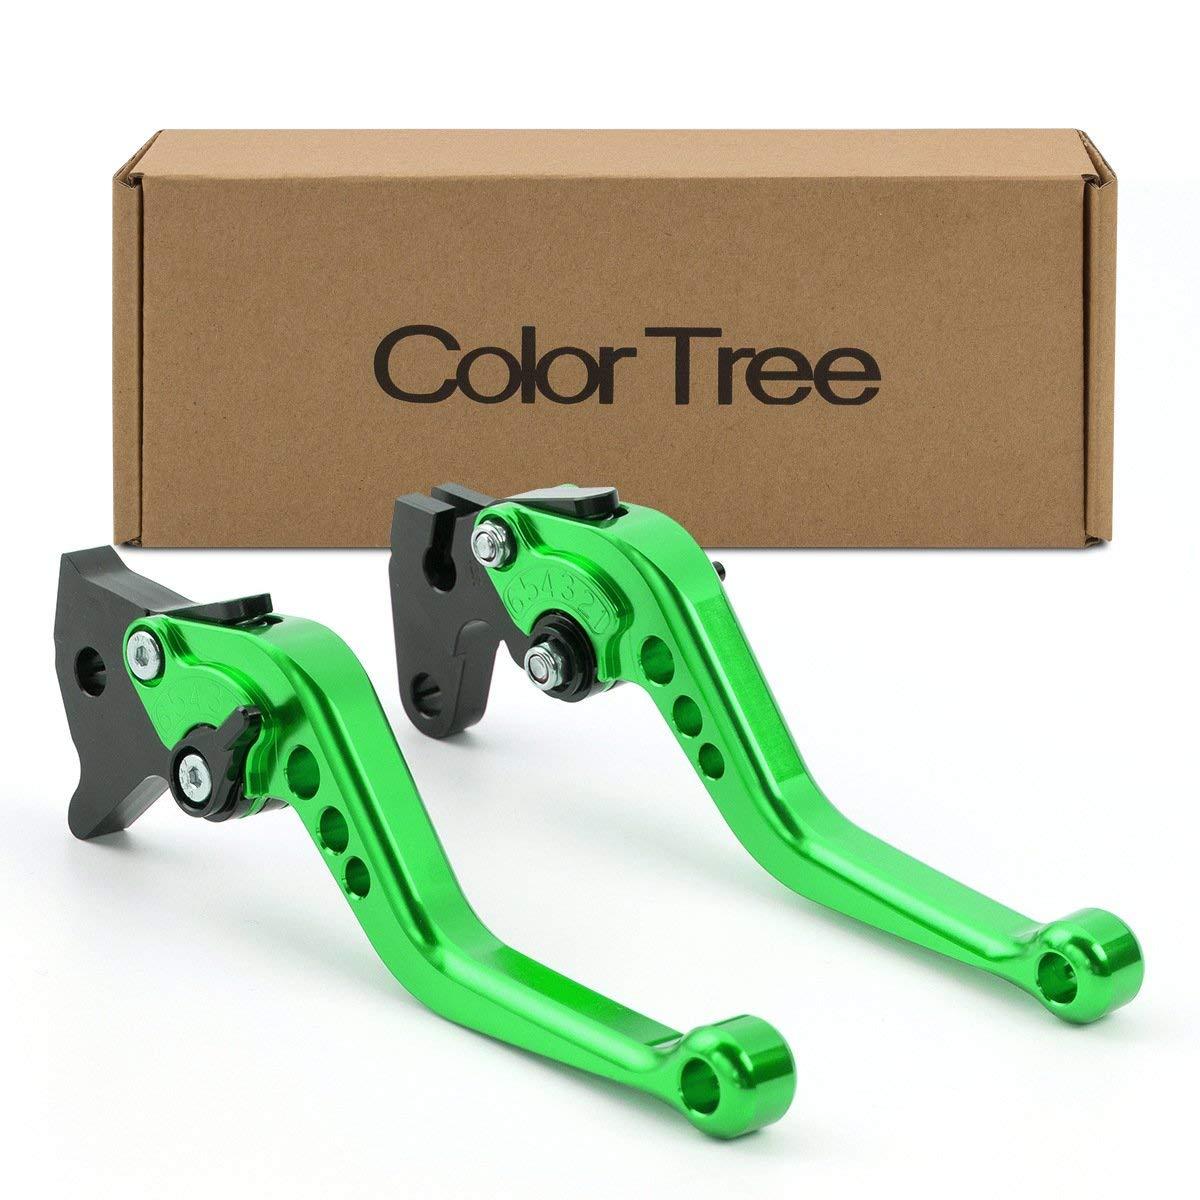 Cheap Sym Vespa Find Deals On Line At Alibabacom Gt200 Fuse Box Location Get Quotations Color Tree Frontrear All Disc Brake Levers Fit For Vna Vnb Vnc Vnl Vba Vbb